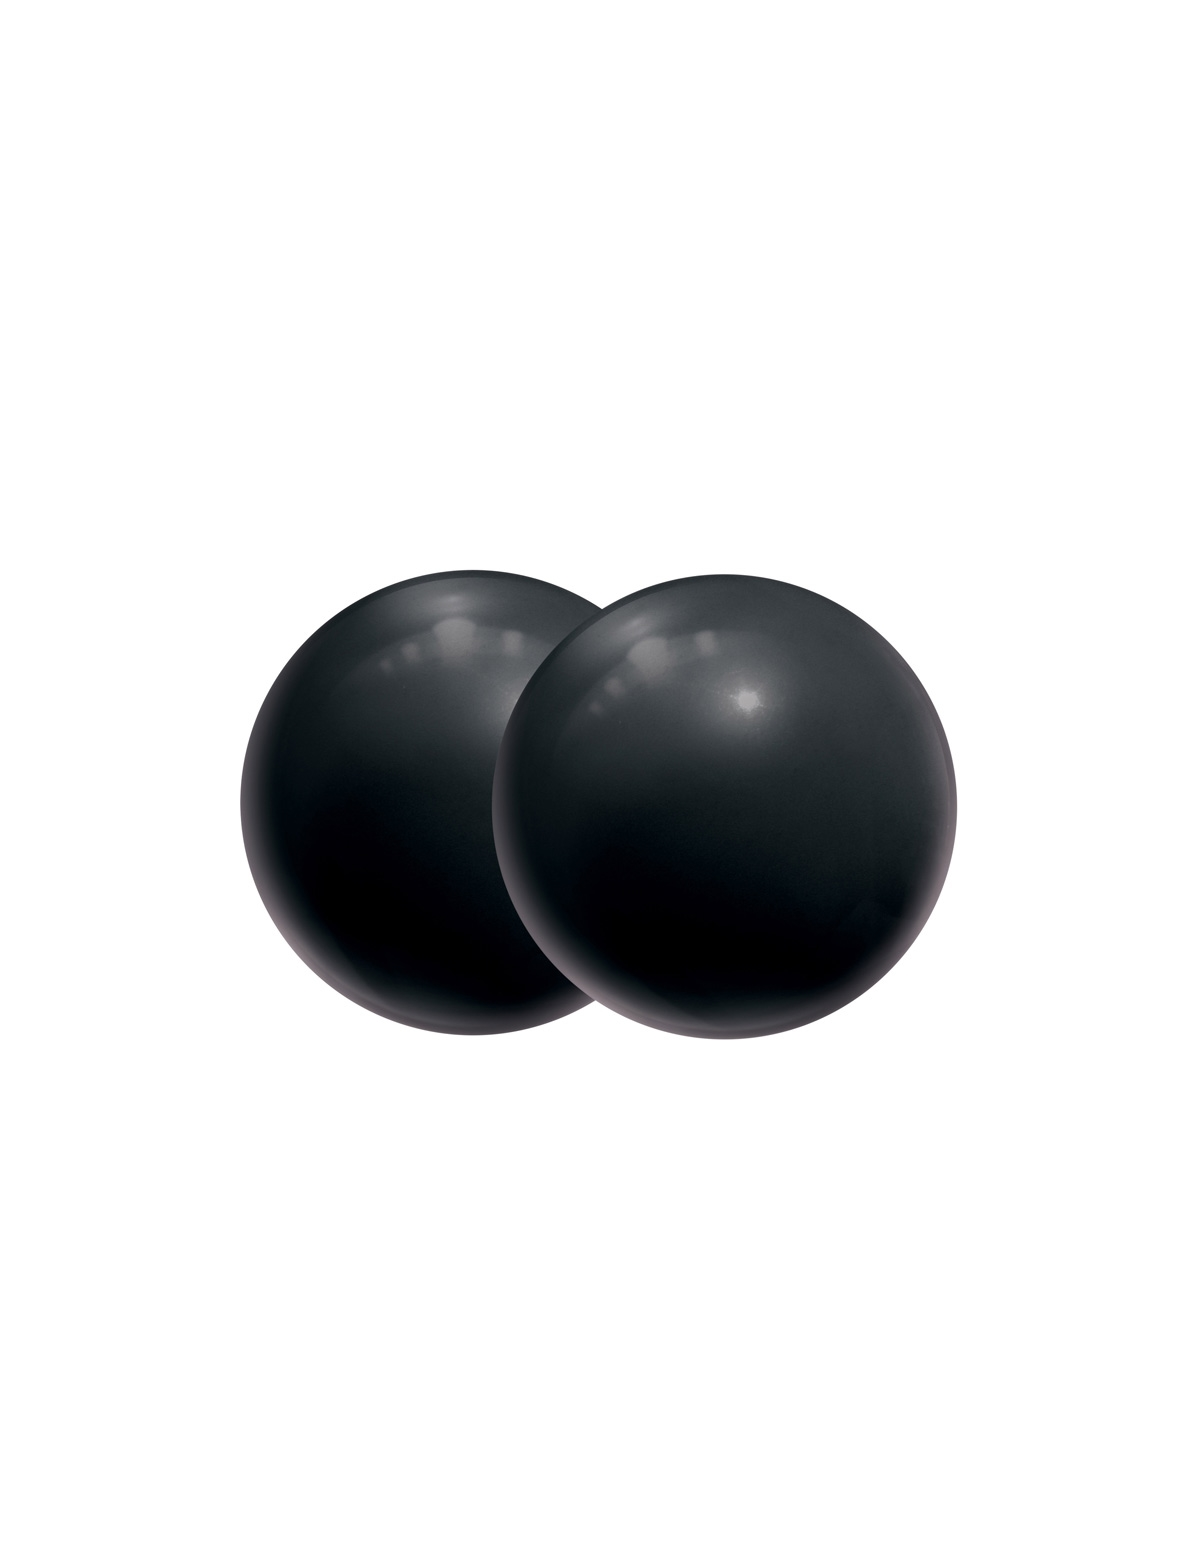 Silicone Weighted Ben Wa Balls